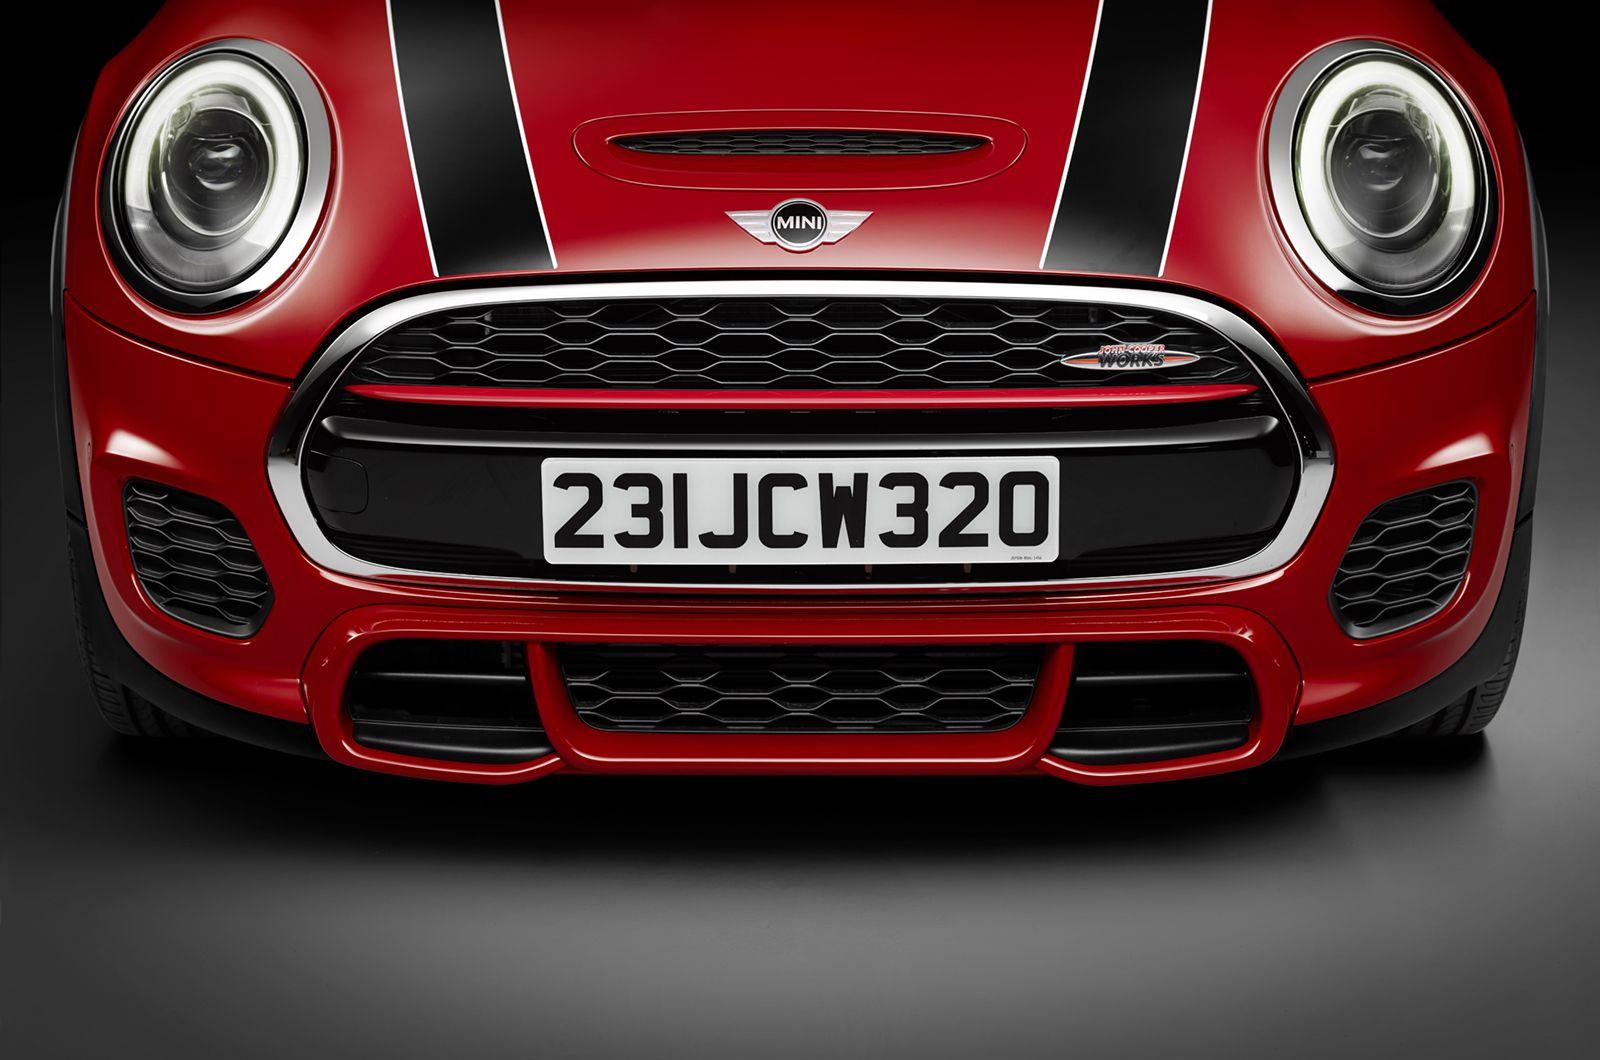 Bayersiche Motoren Werke F56 Mini Cooper S JCW 2015